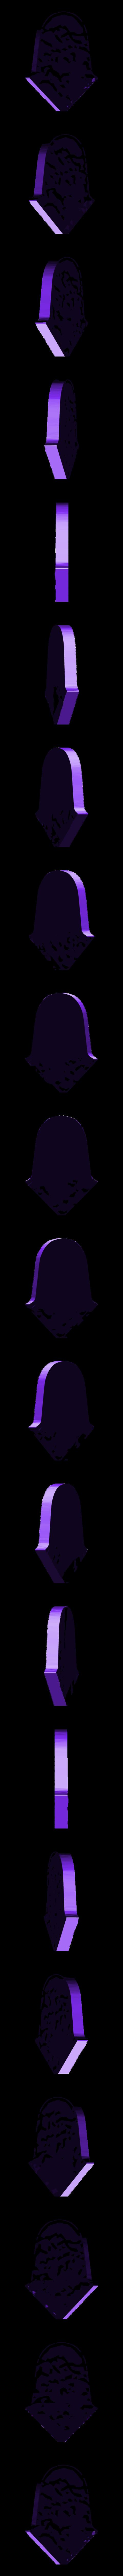 SG_FaceP_Logo_Black.stl Download free STL file Space Ghost - Facepalm • 3D printable model, mag-net